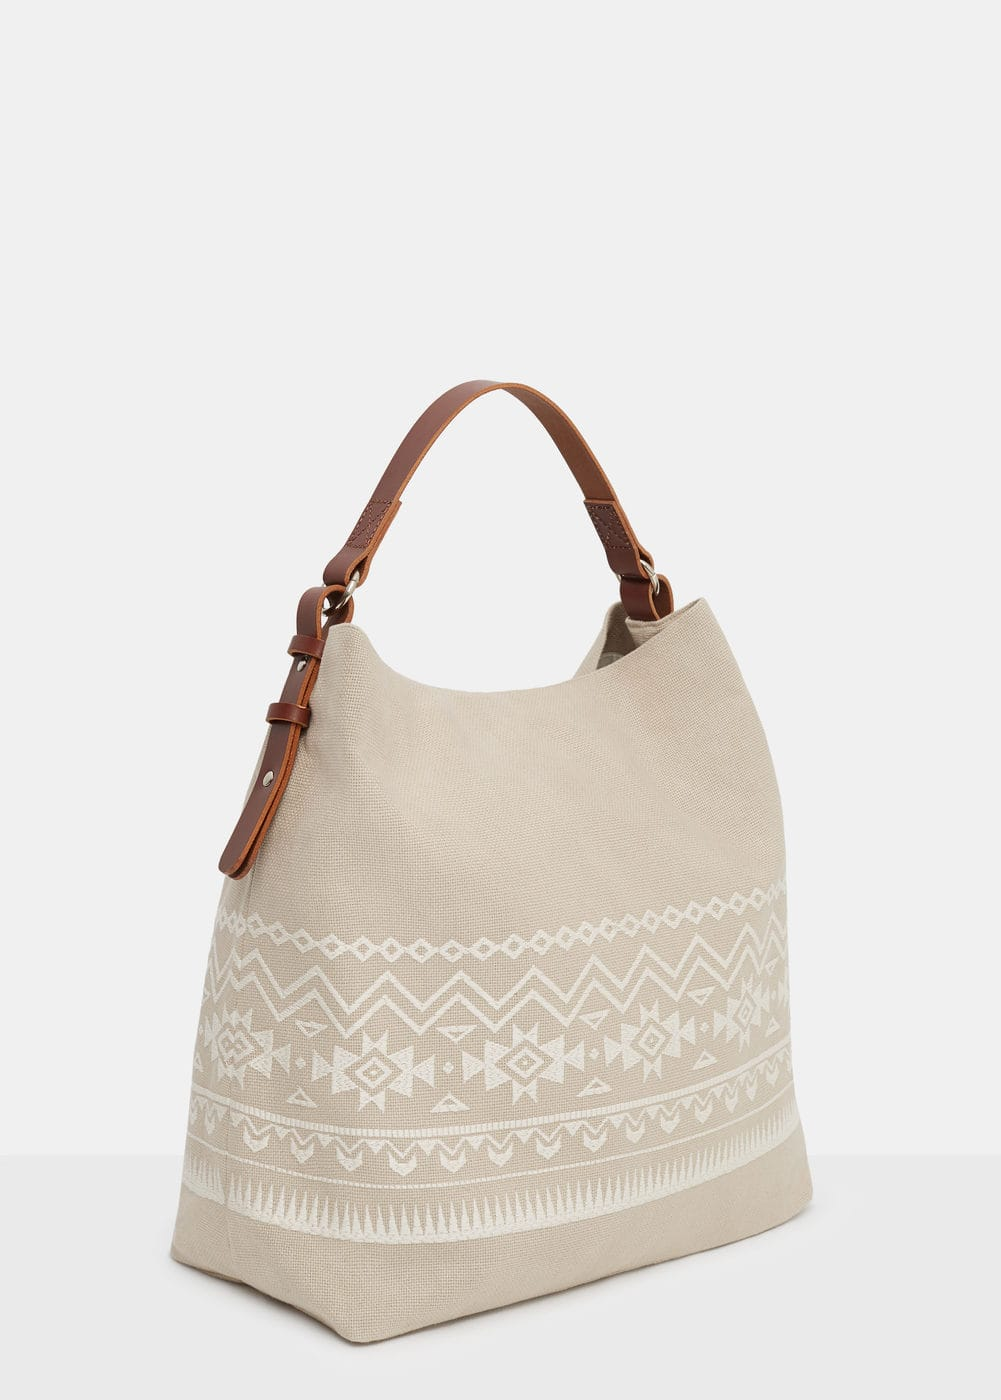 Embroidered shopper bag   VIOLETA BY MANGO